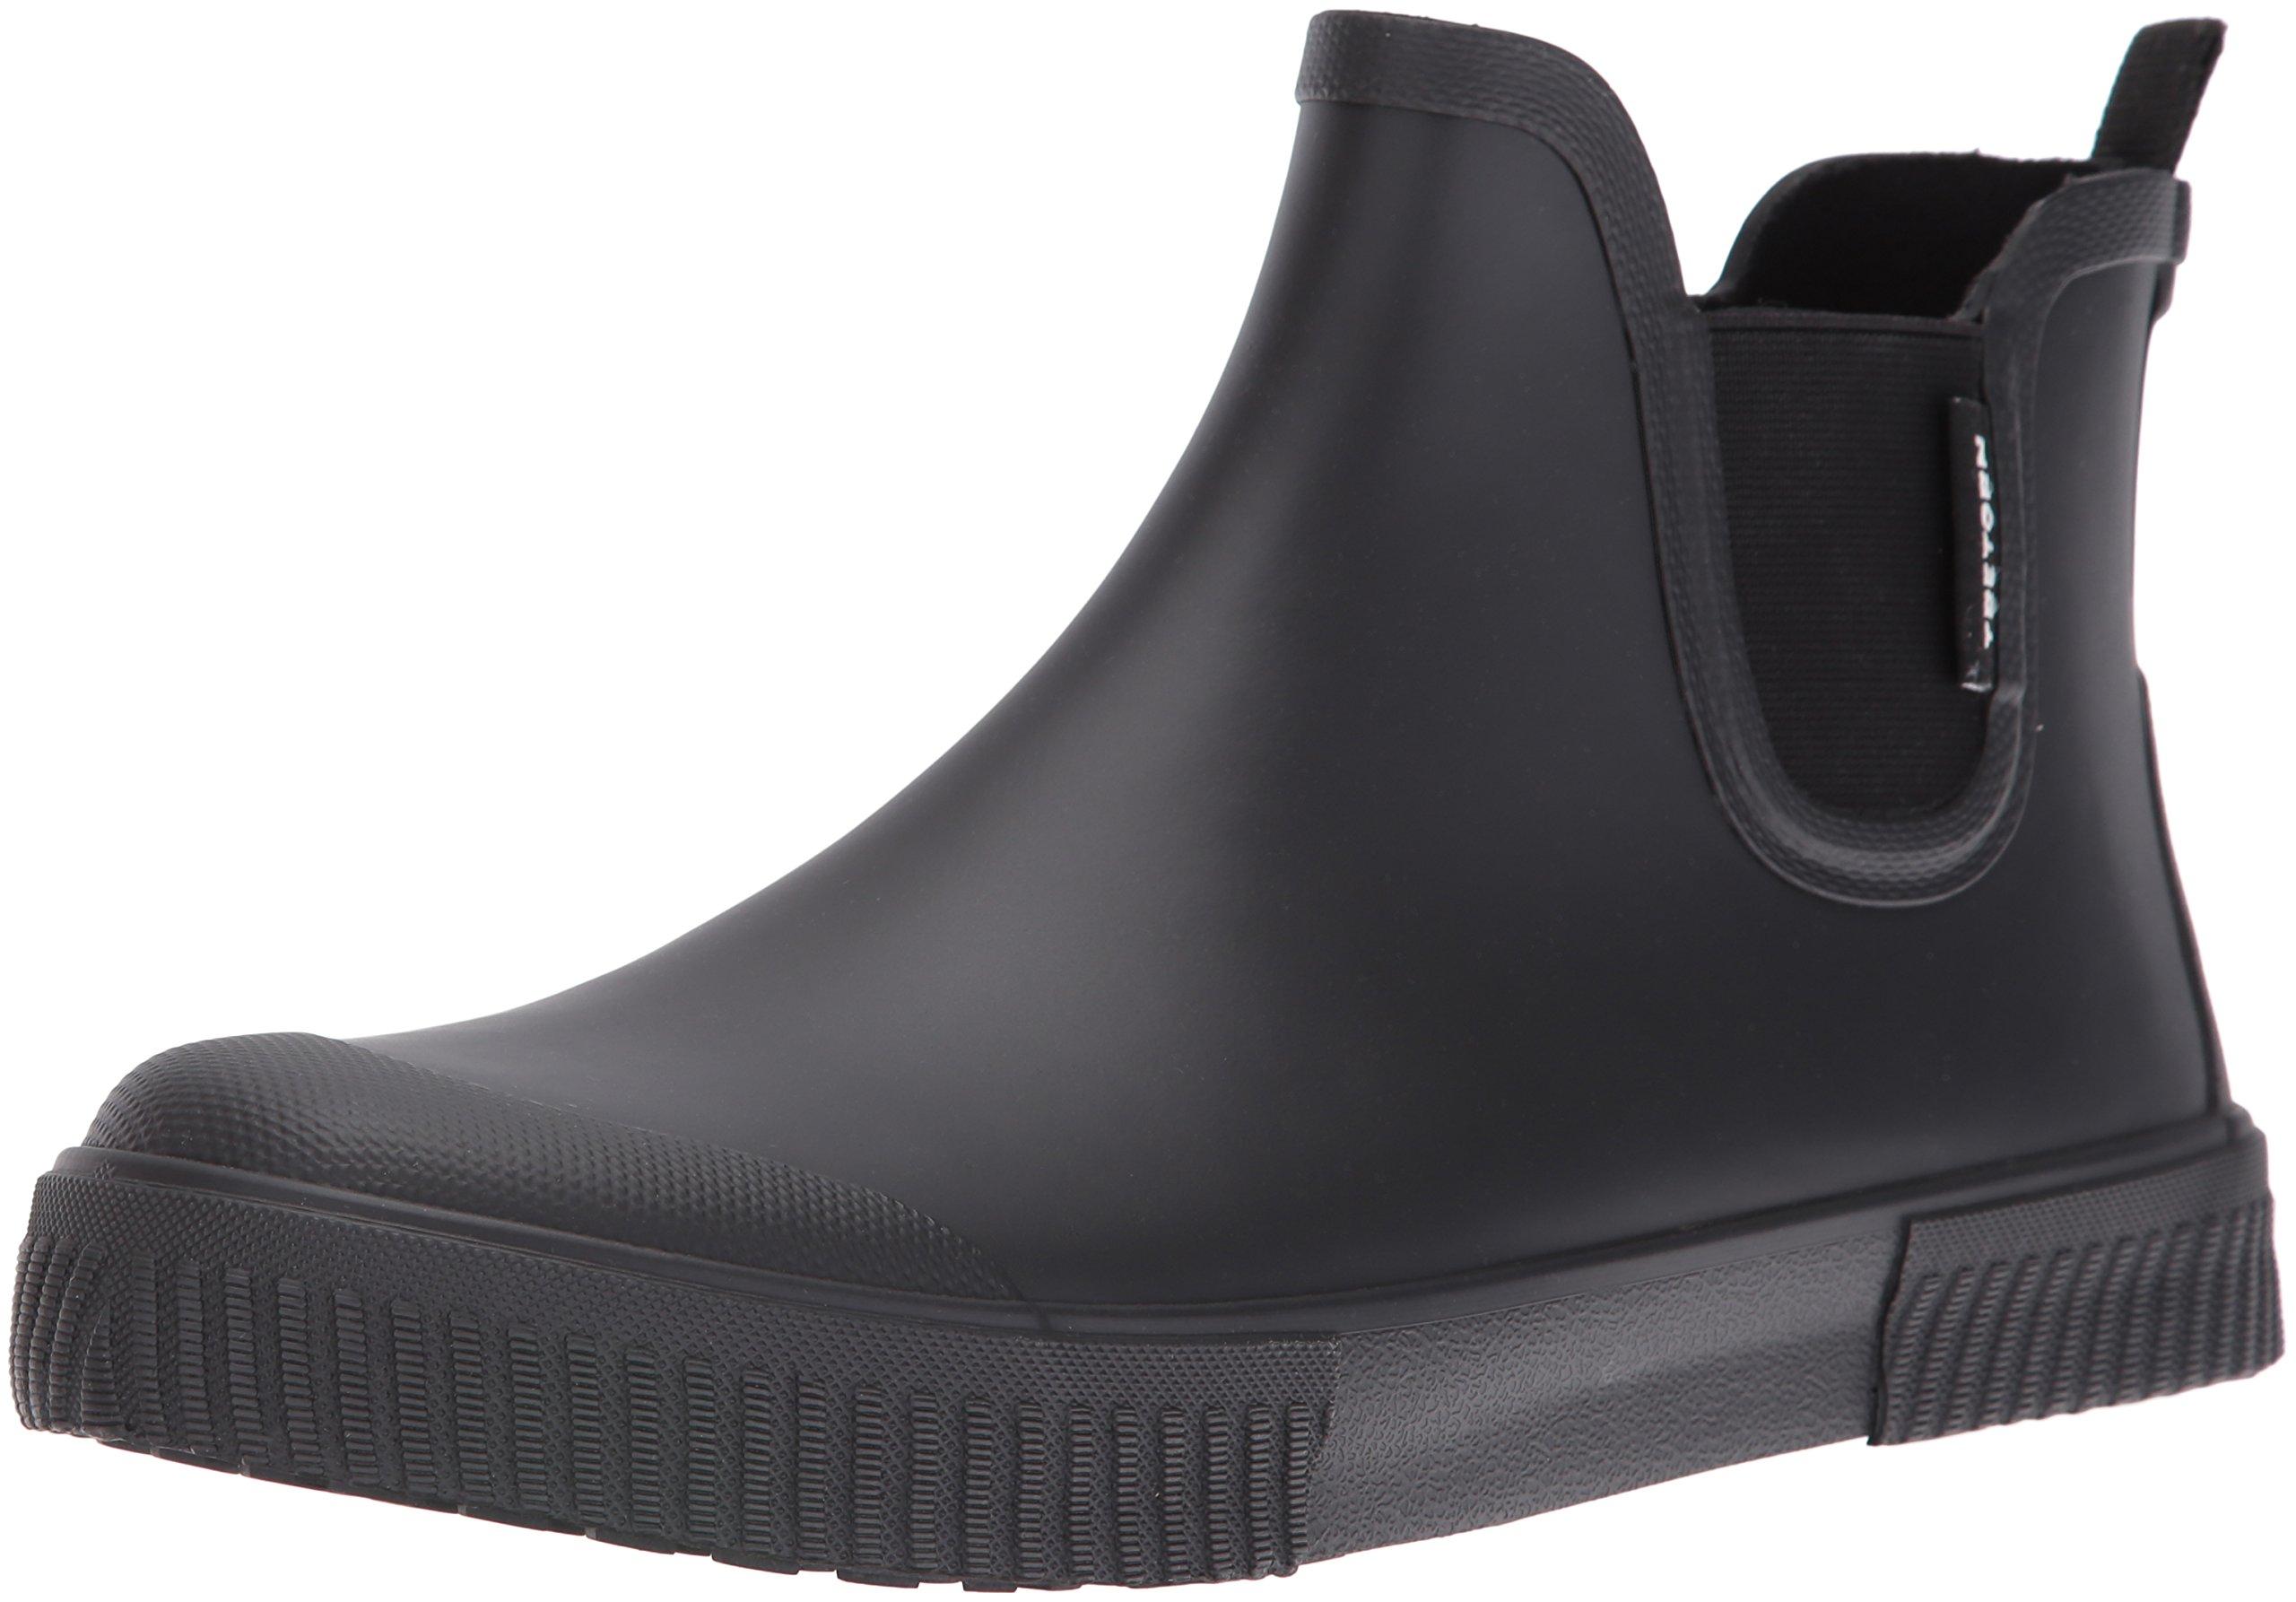 Tretorn Men's Gus Rain Boot, Black/Black/Black, 9 M US by Tretorn